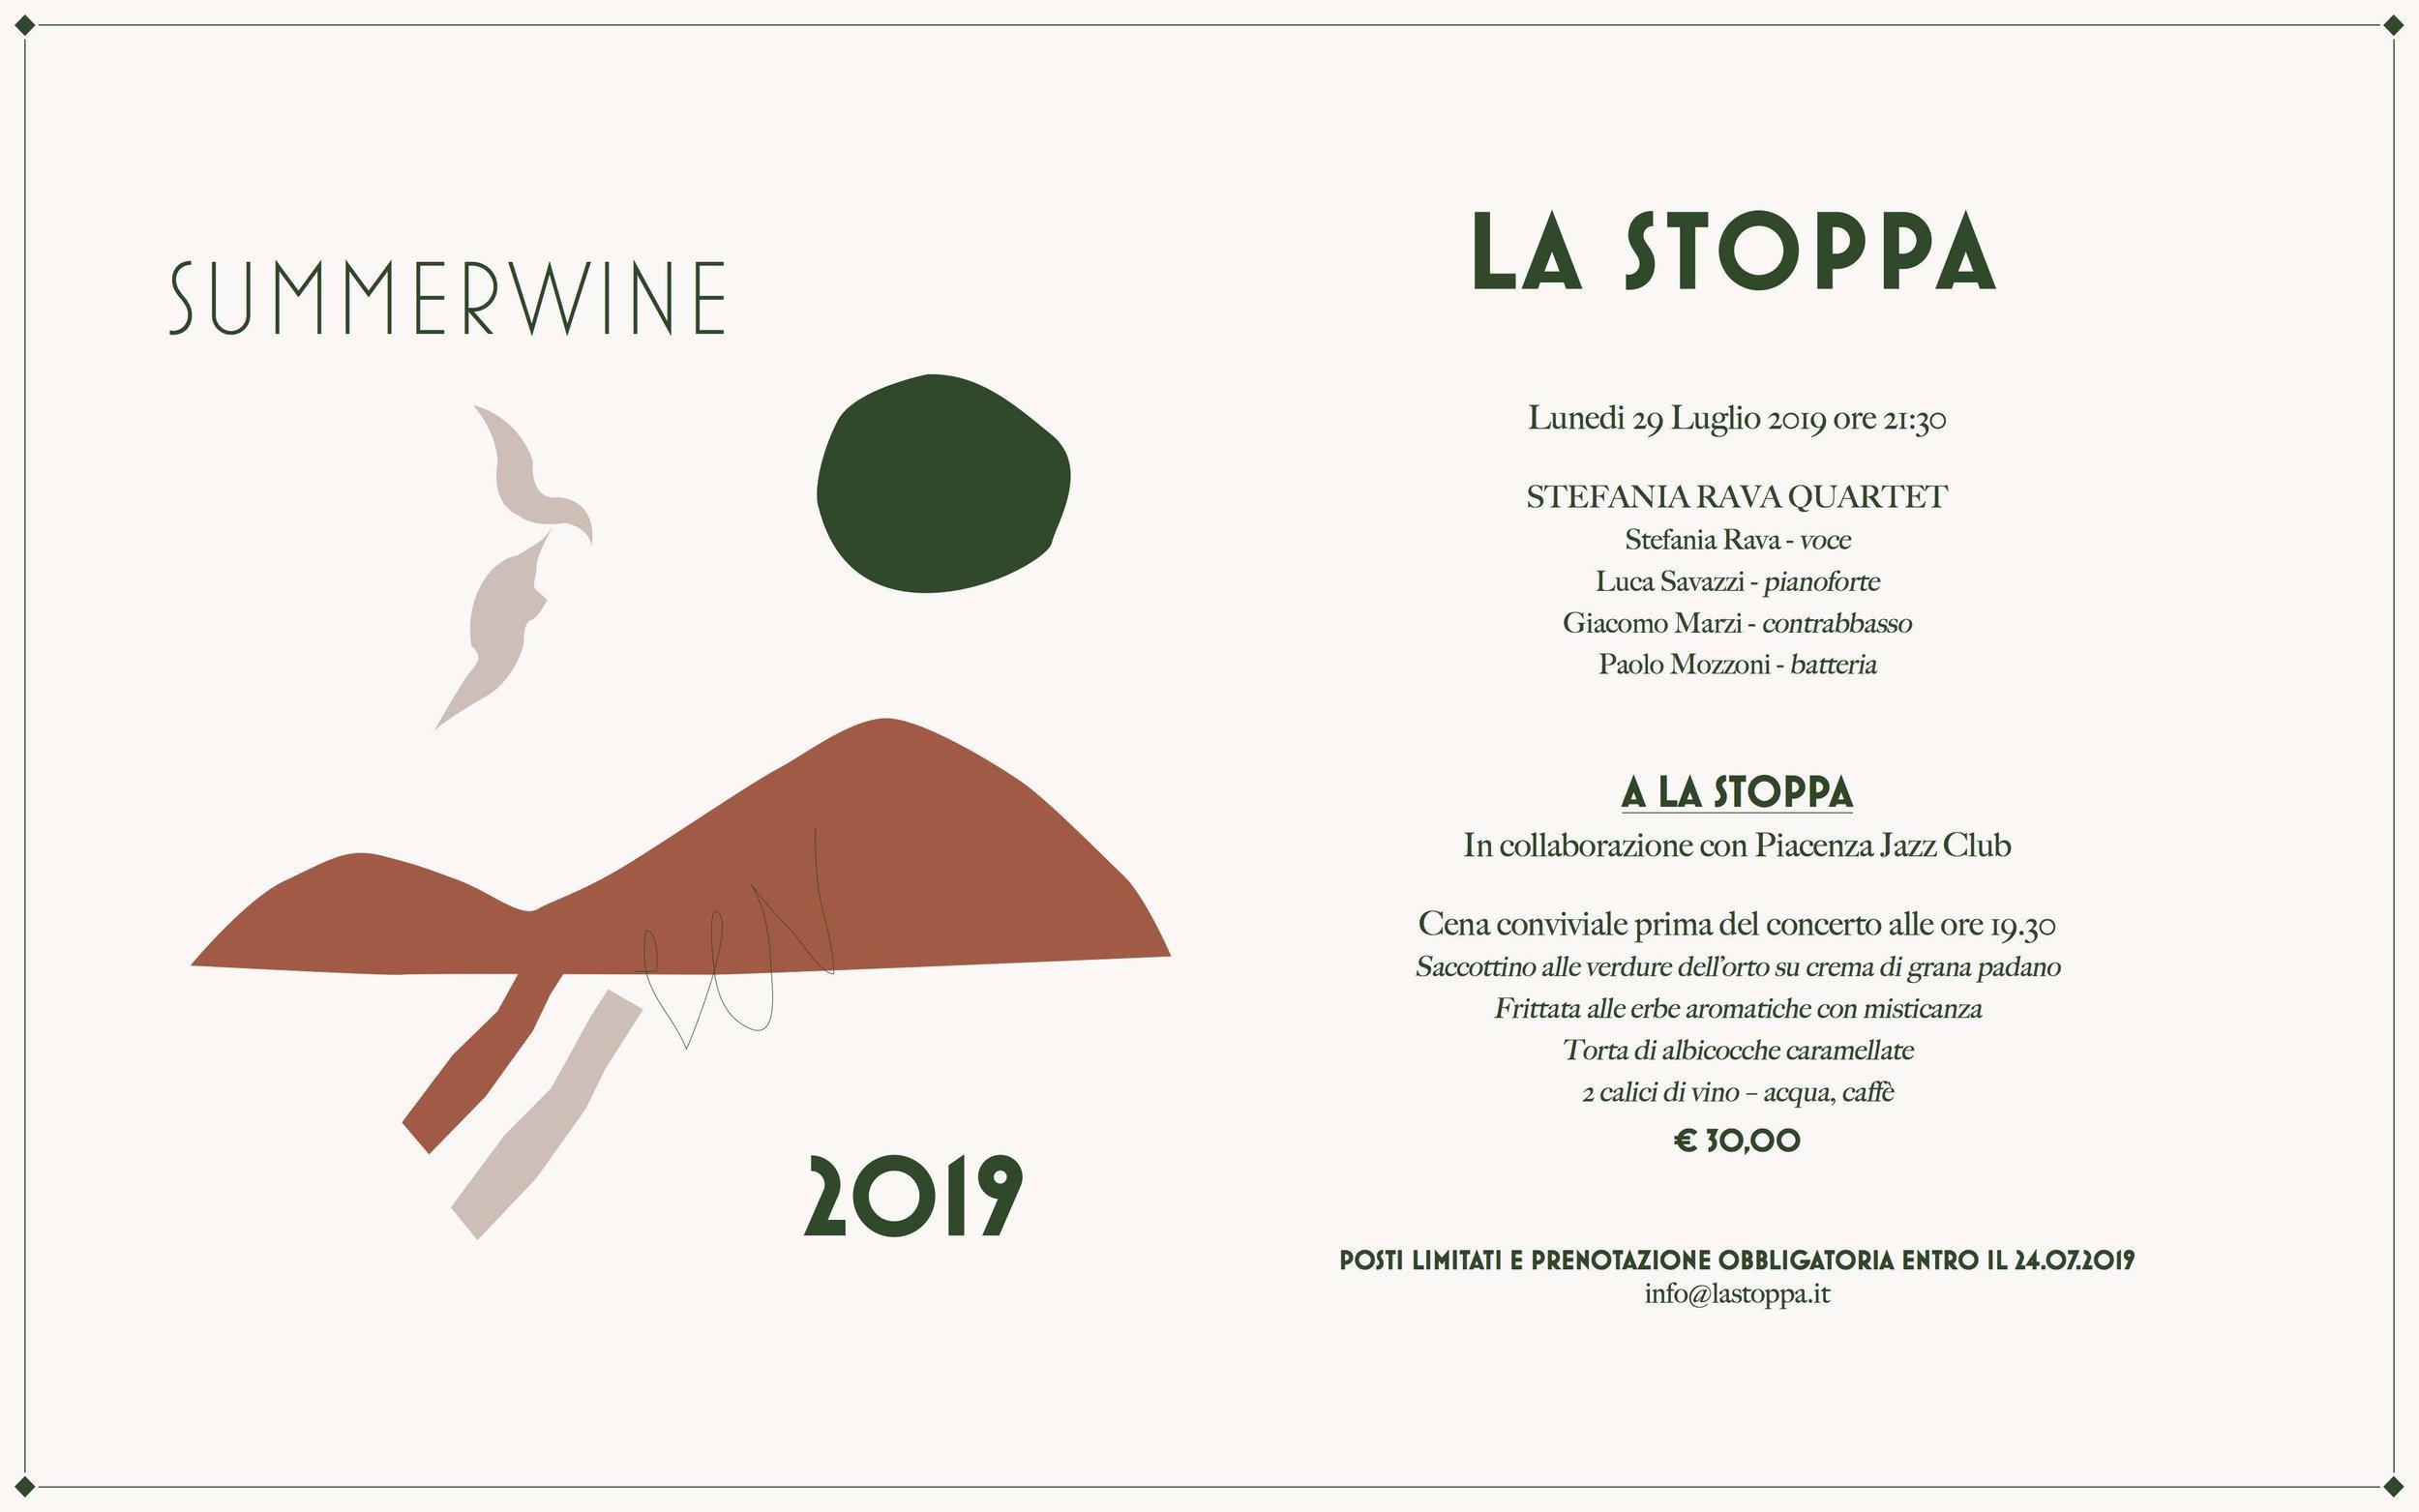 LASTOPPA_summerwine-2019.jpg